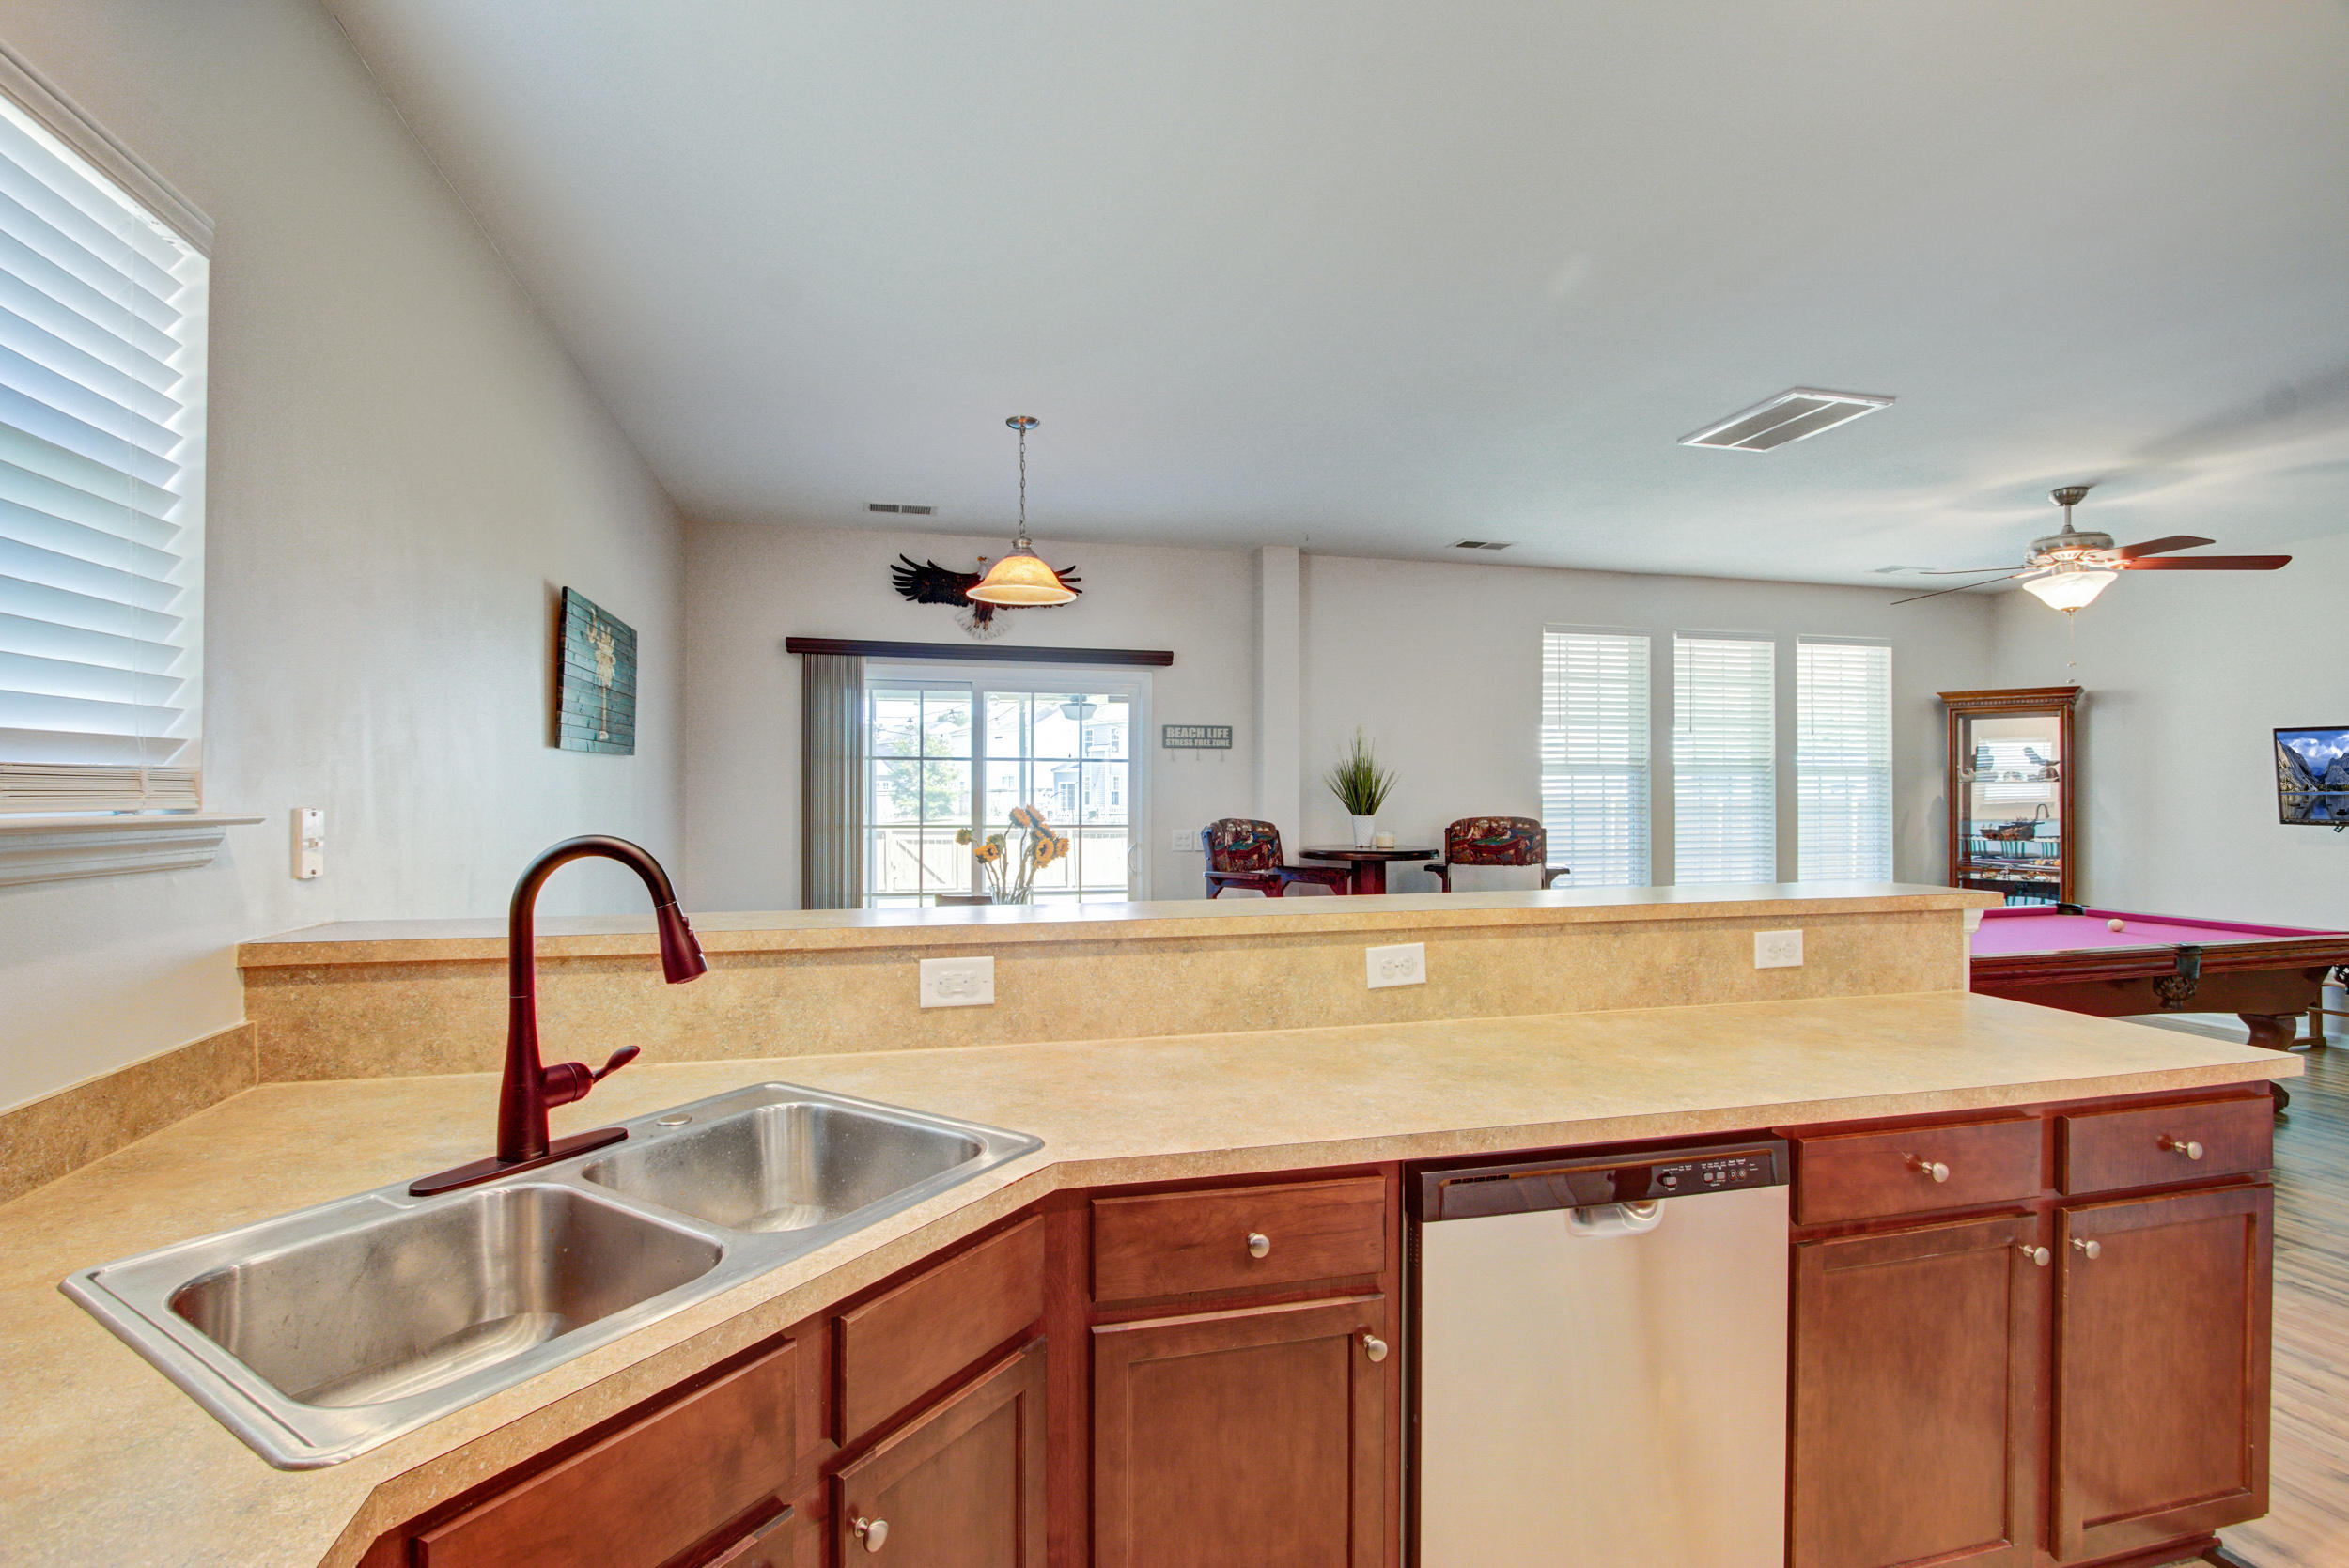 Oakley Pointe Homes For Sale - 576 English Oak, Moncks Corner, SC - 49